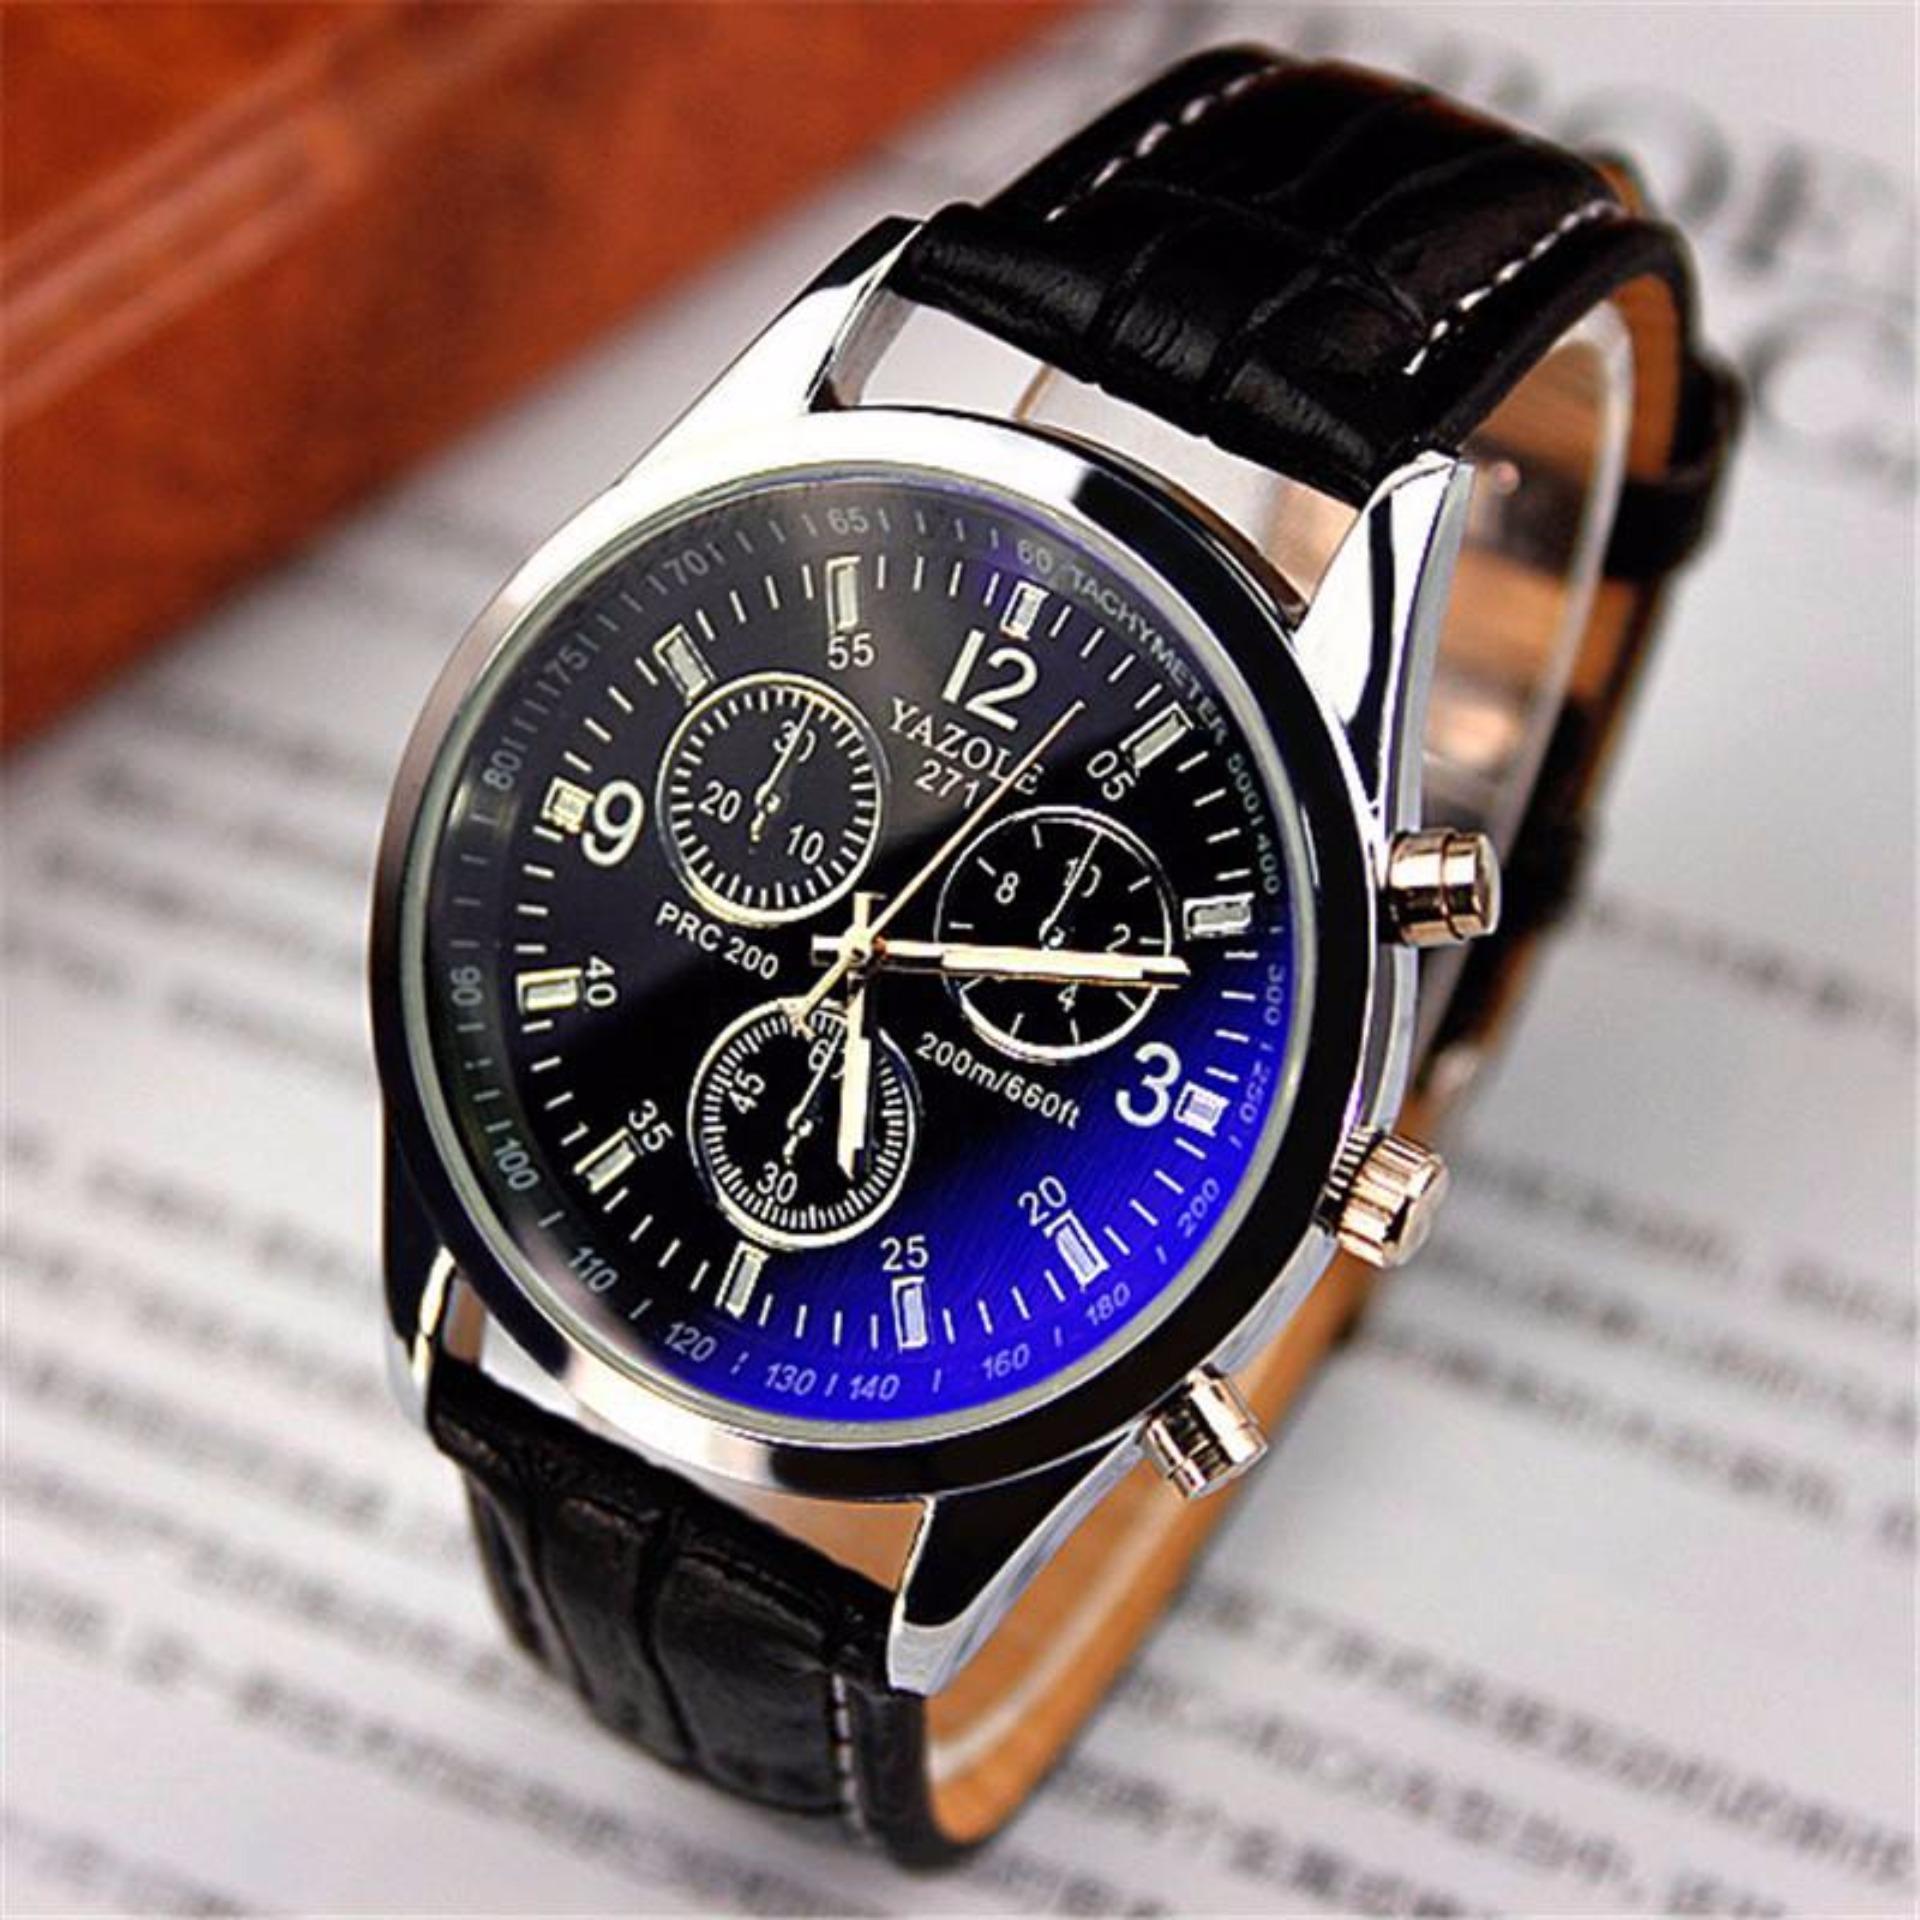 Đồng hồ nam dây da Yazole 271 giá tốt (dây đen mặt đen)